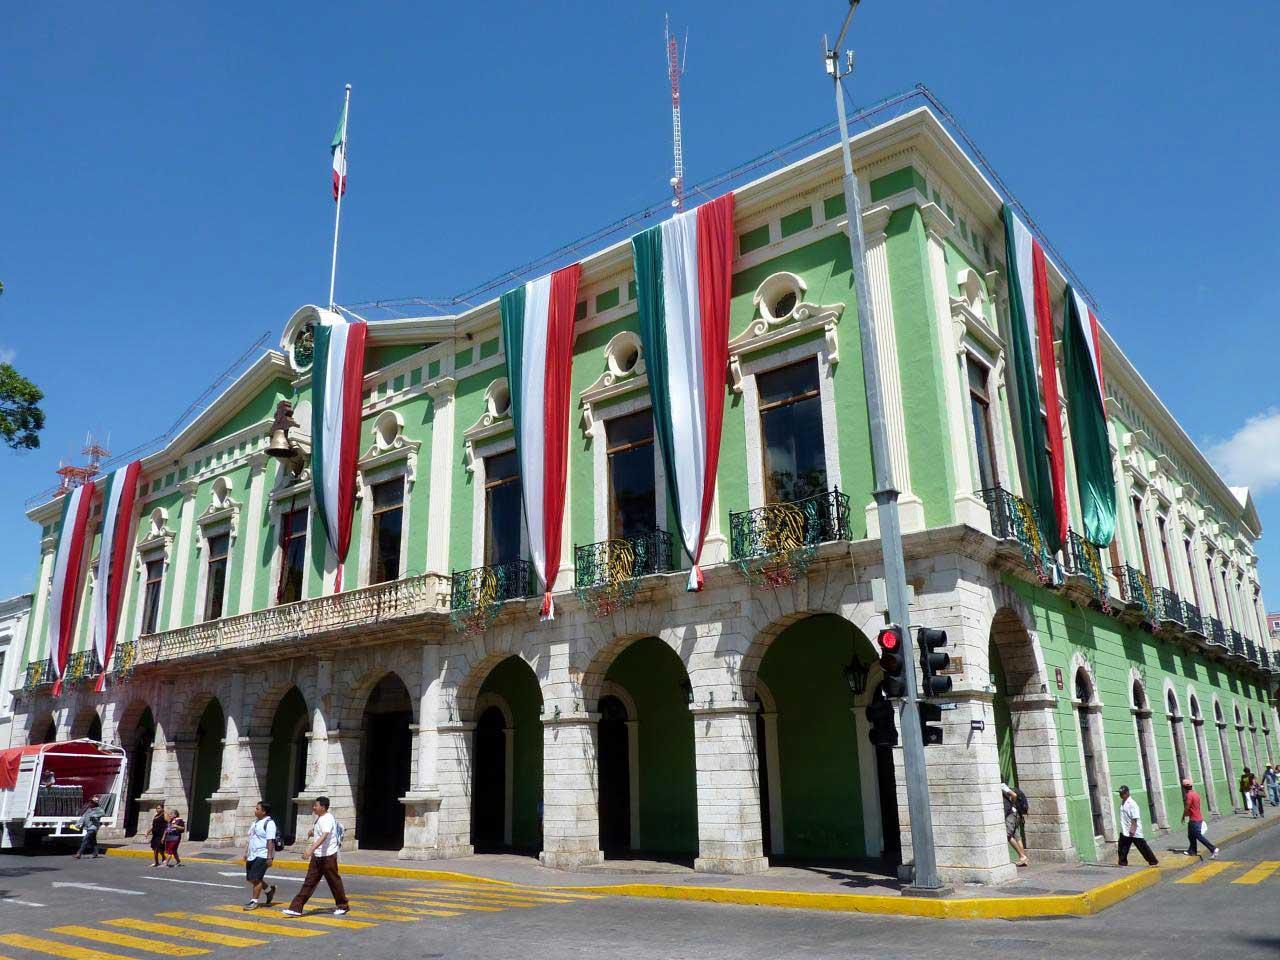 Mérida, la cité mythique des mayas